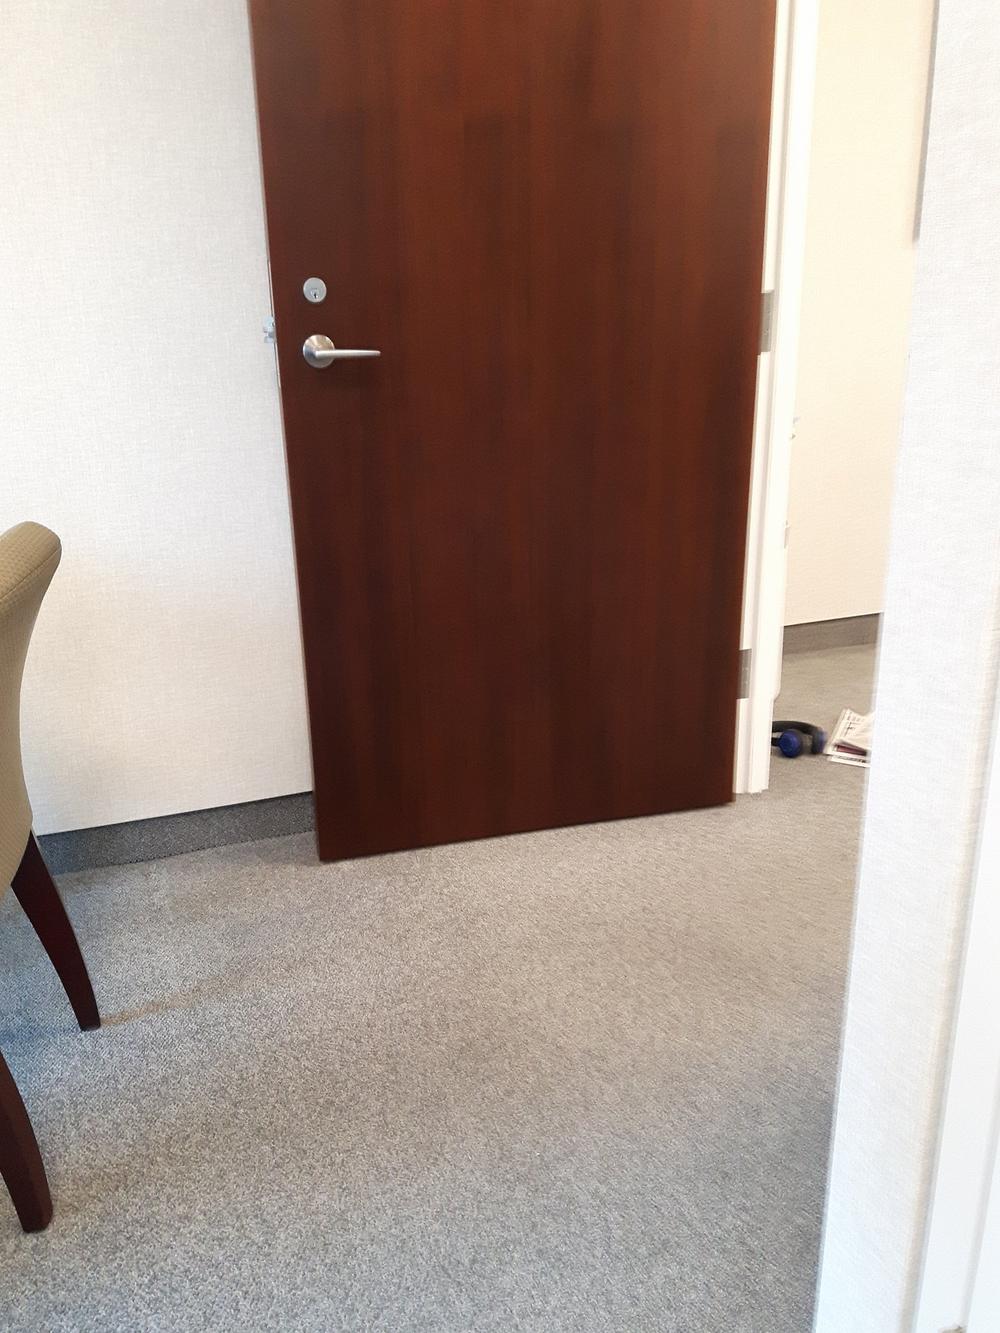 TUP DOOR REPAIR AFTER.png